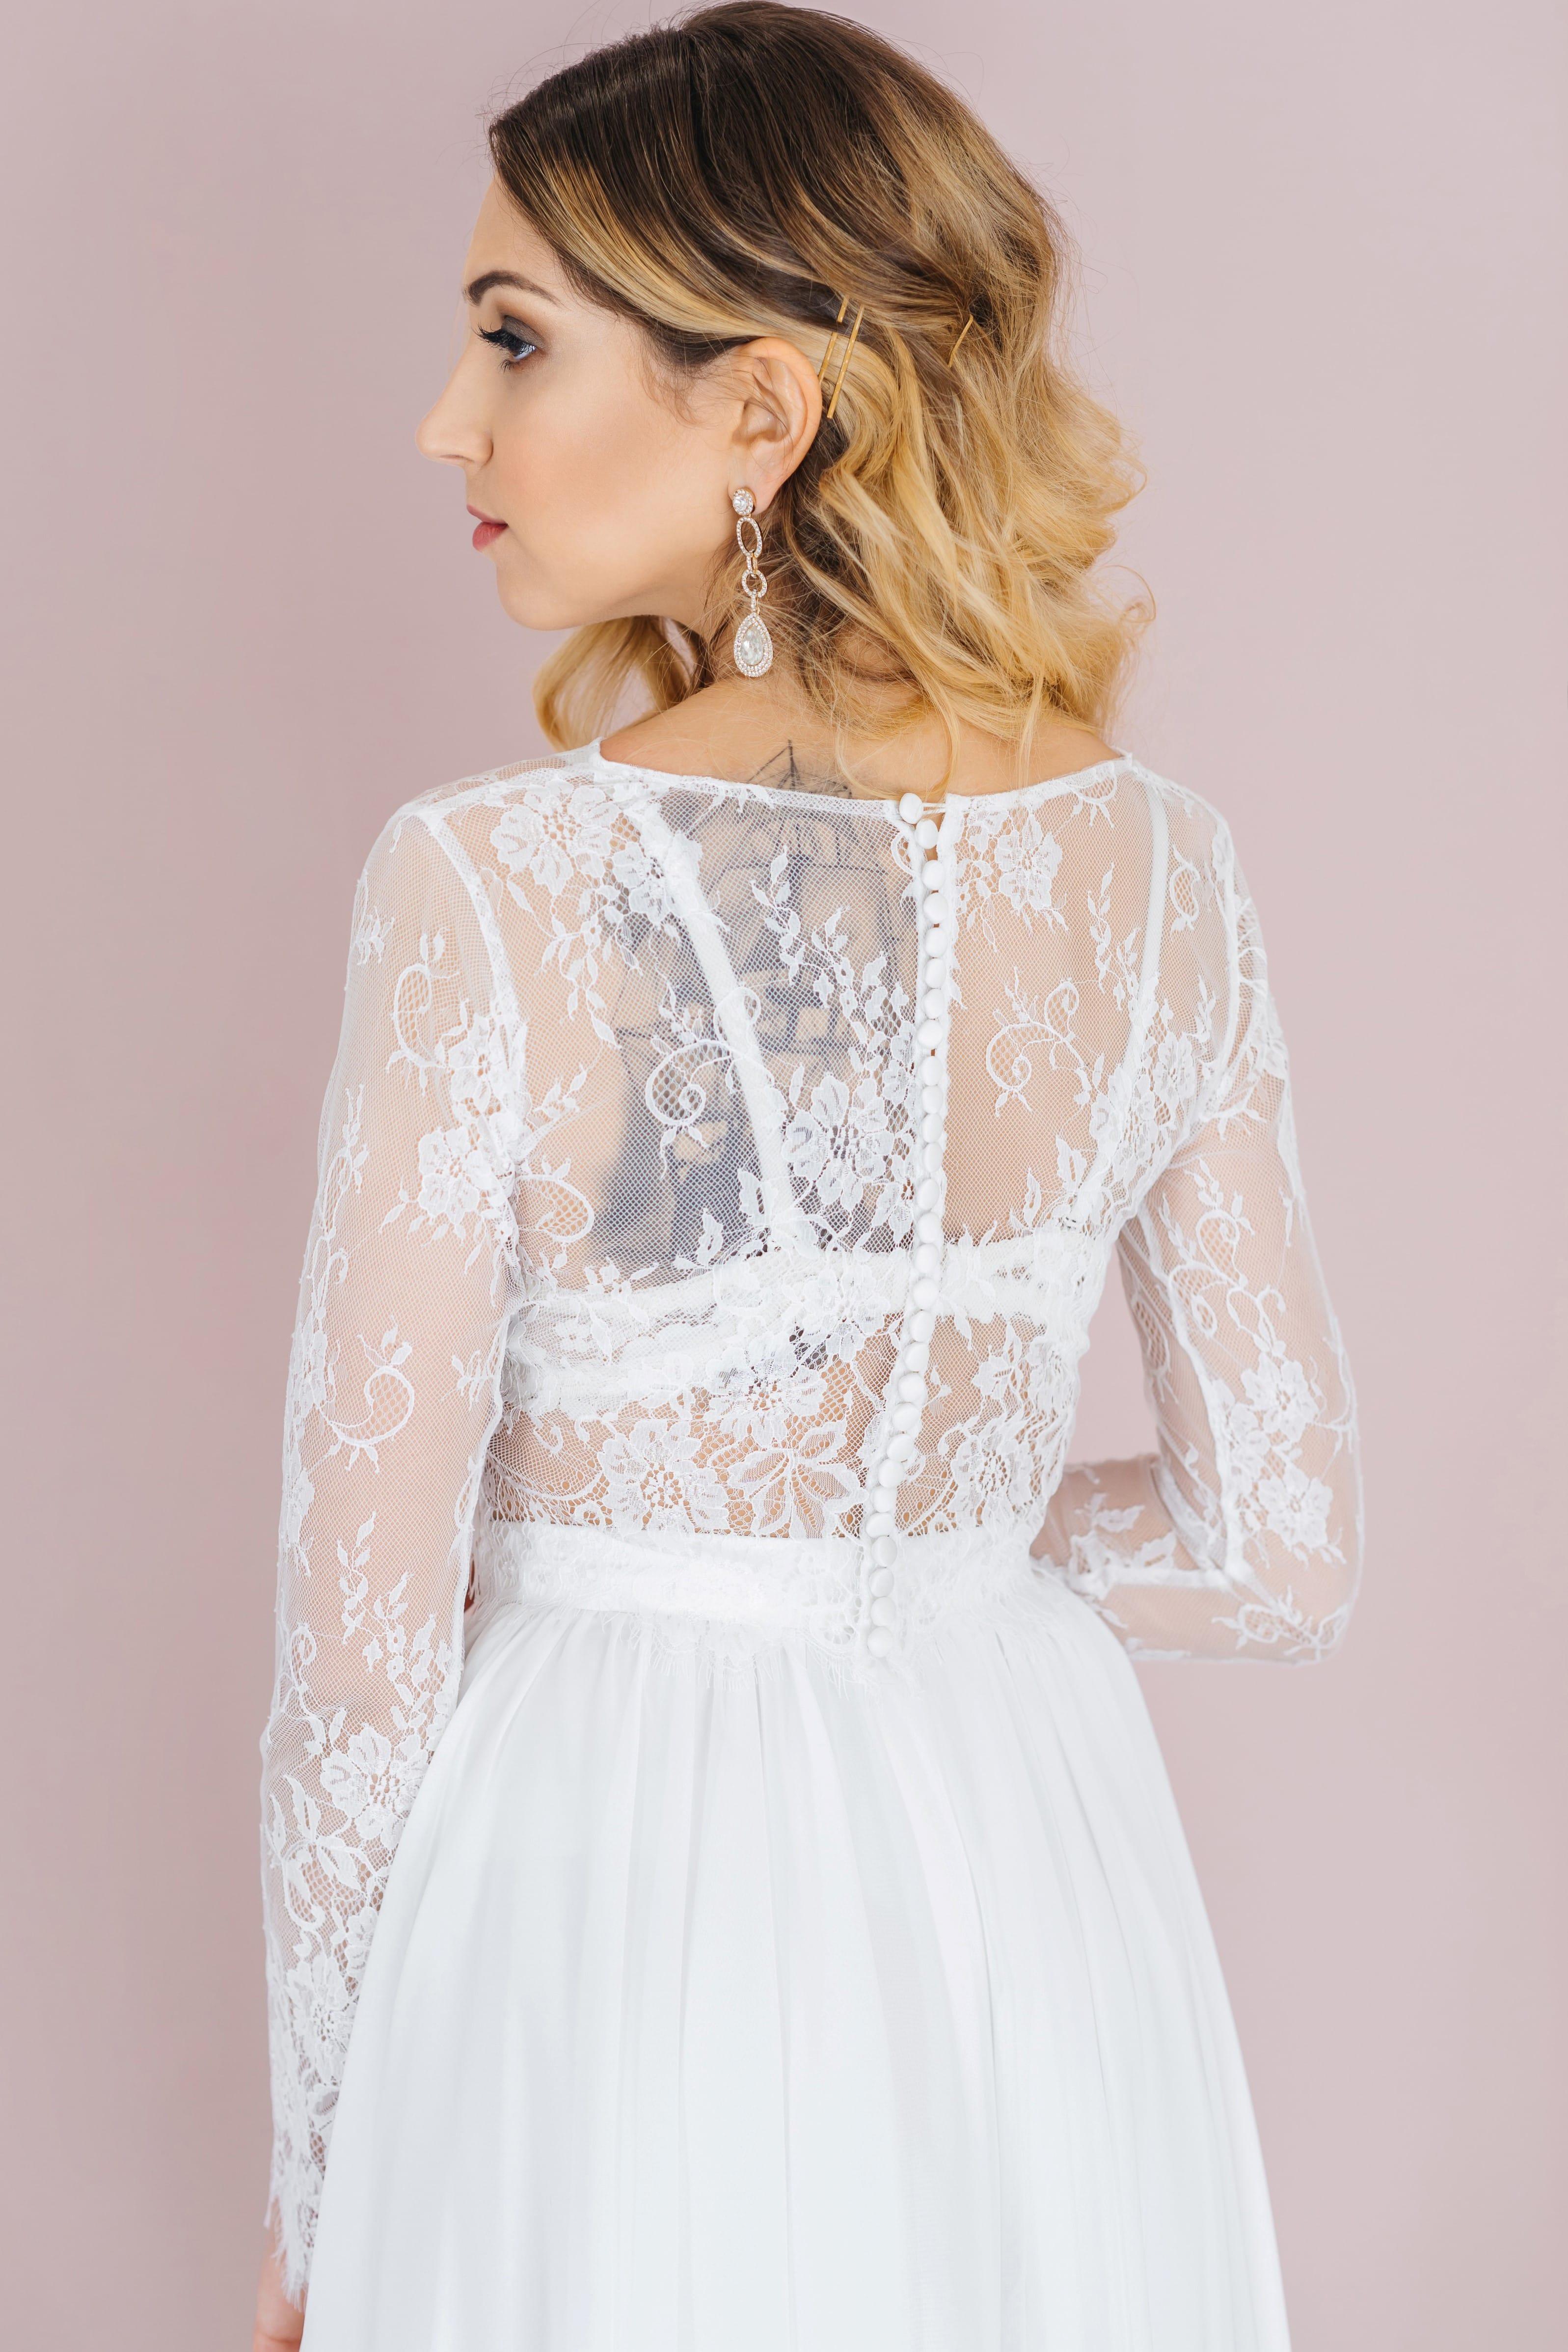 Свадебное платье CHALSIE, коллекция LOFT, бренд RARE BRIDAL, фото 5